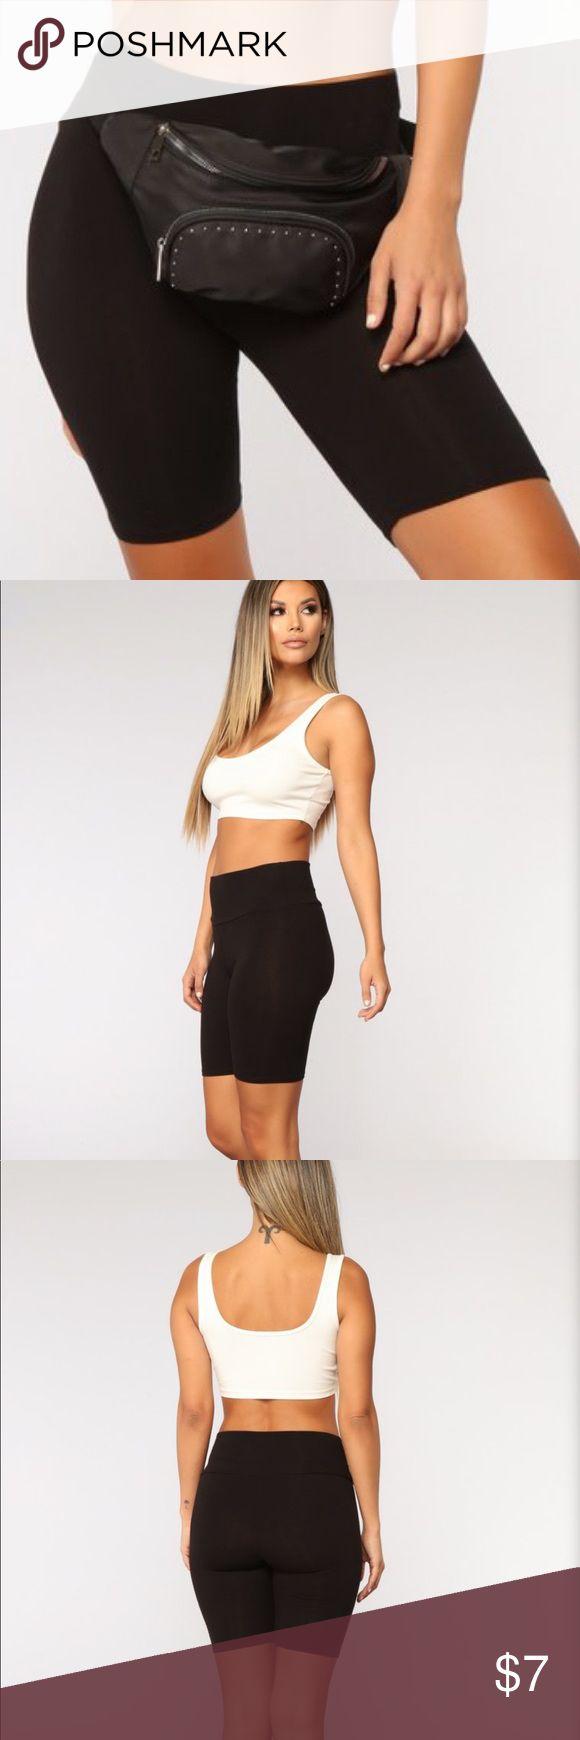 Fashion Nova Biker Shorts This is called the Brooke Biker Shorts from Fashion No…   – My Posh Closet